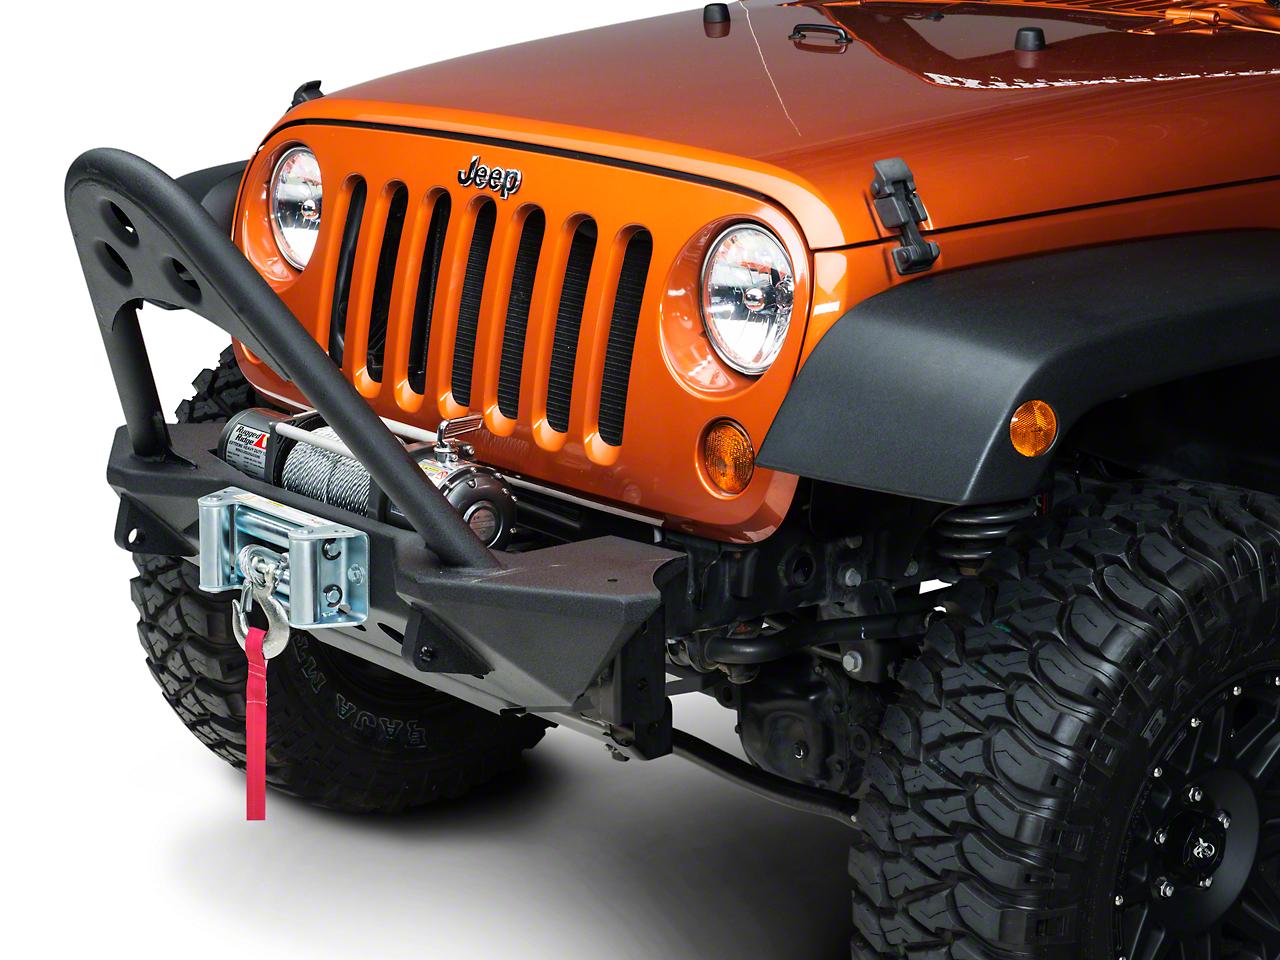 Smittybilt SRC Front Stinger w/ Winch Plate - Textured Black (07-18 Jeep Wrangler JK; 2018 Jeep Wrangler JL)